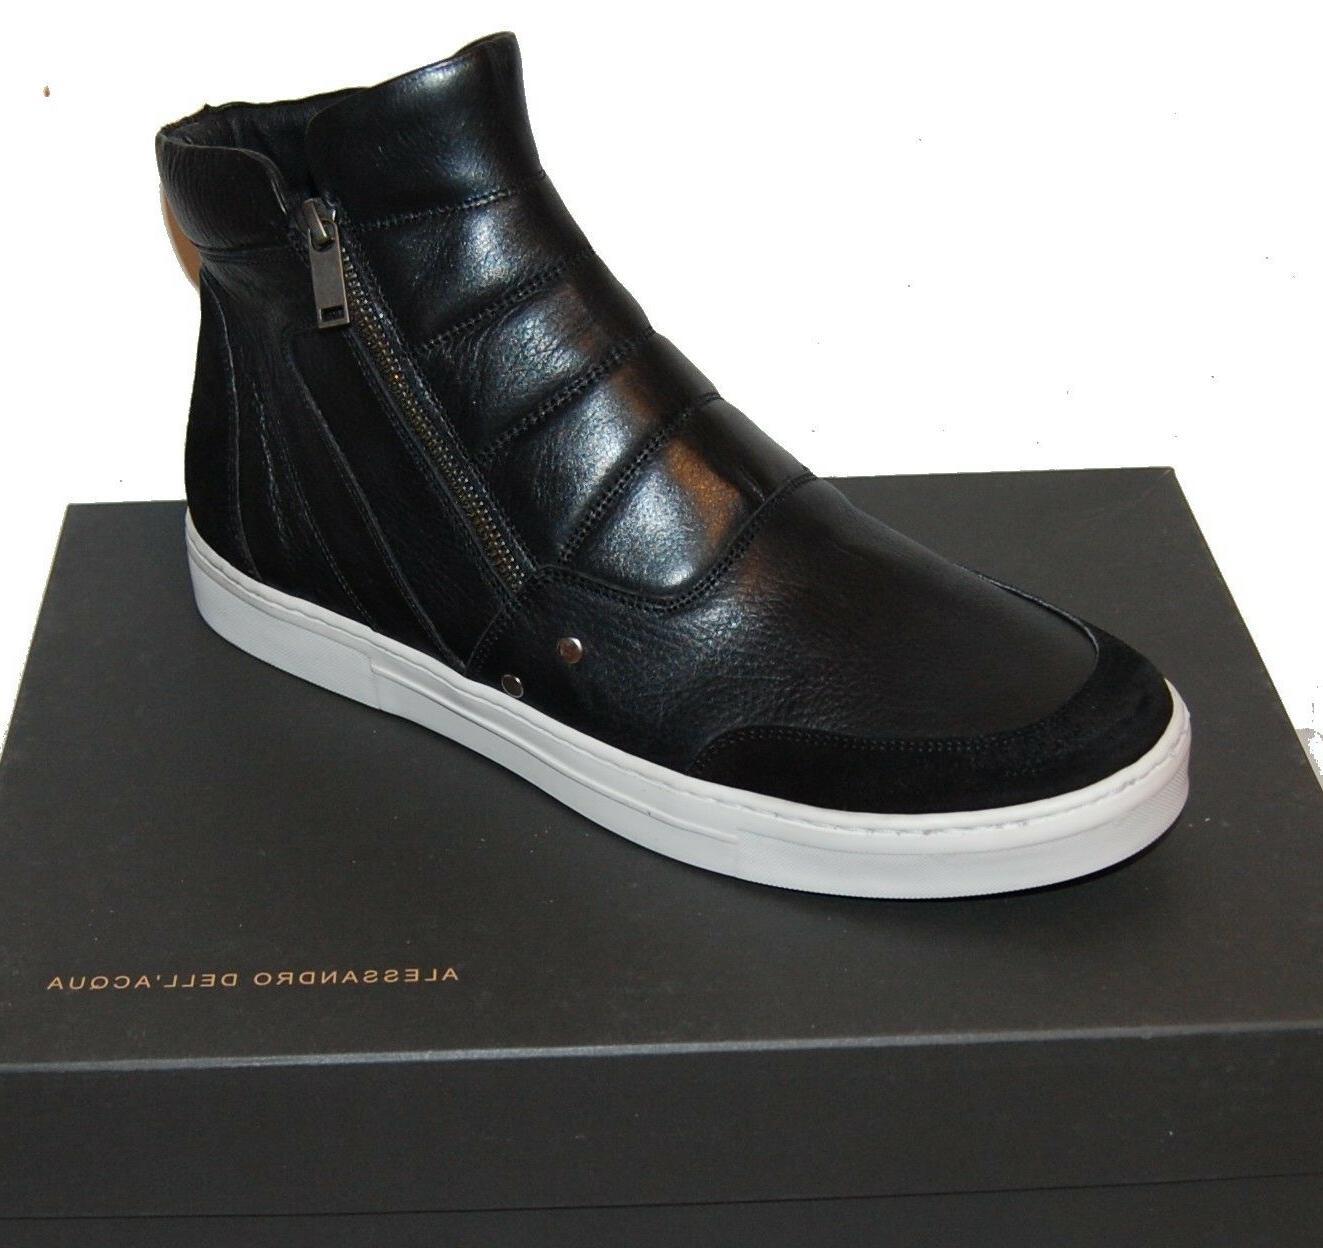 Alessandro DellAcqua Rouge Leather Sneakers 8.5 in 2020